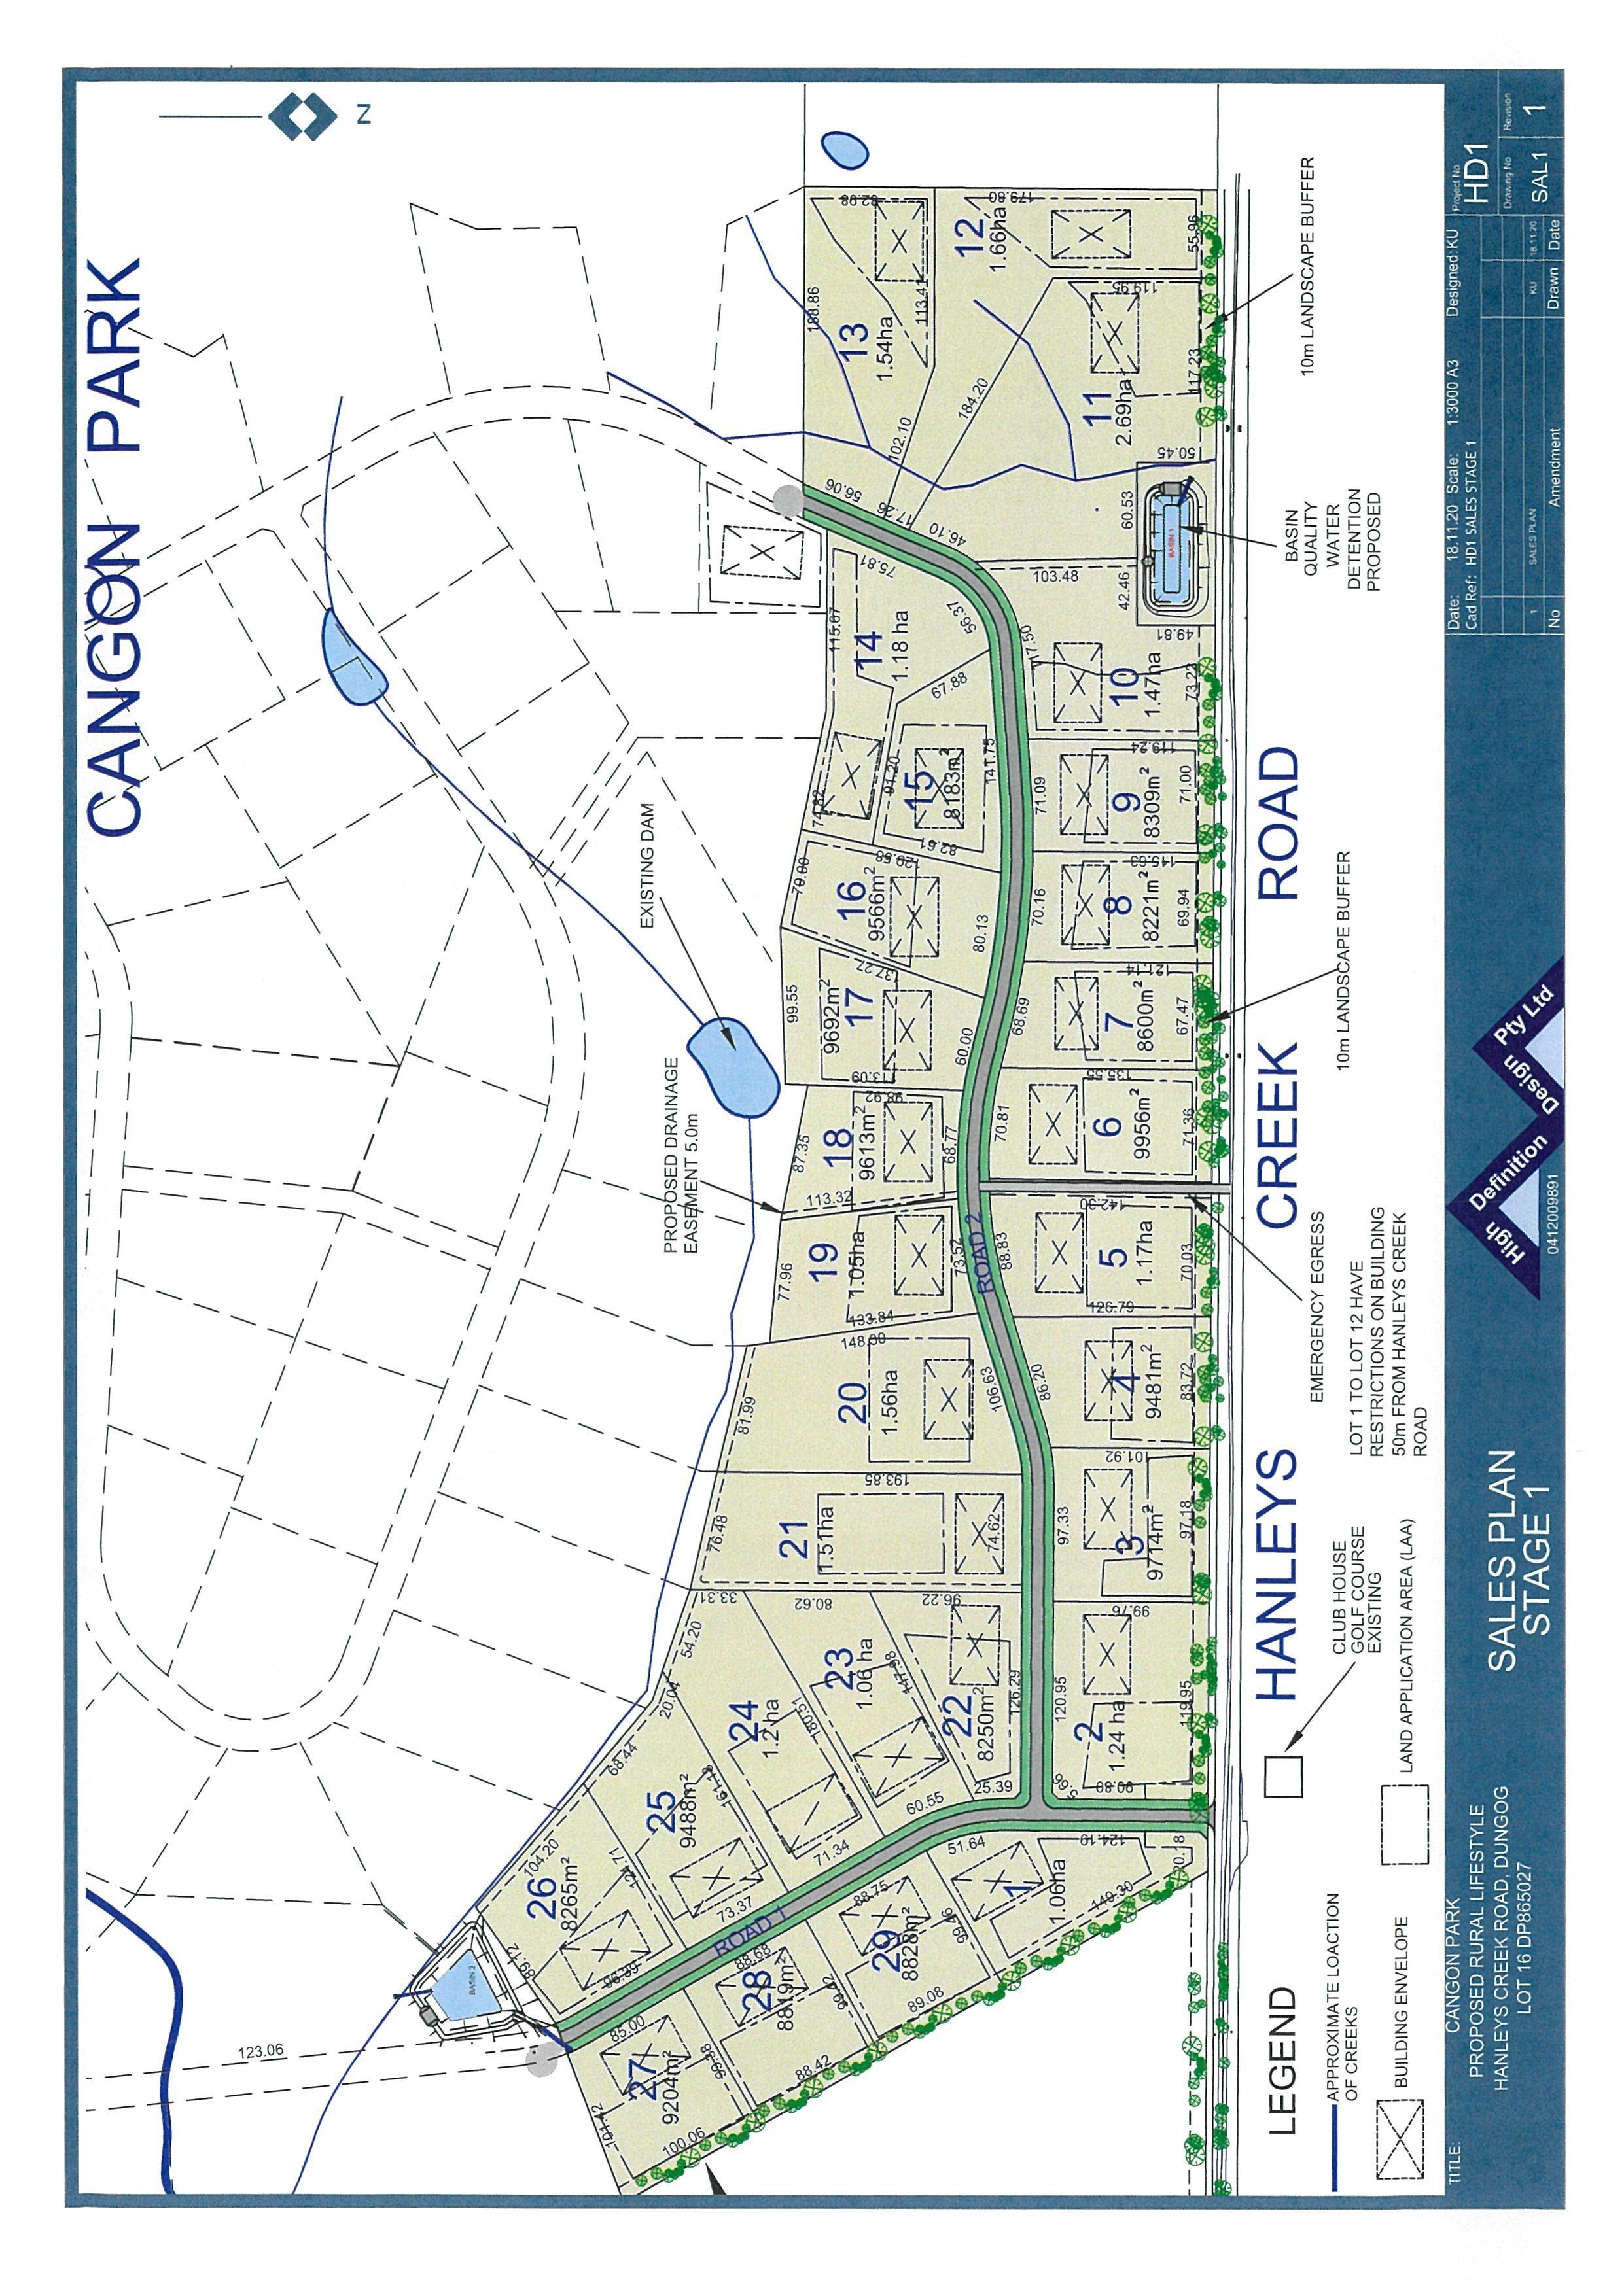 19/Lot 16 Hanleys Creek Road Dungog 2420